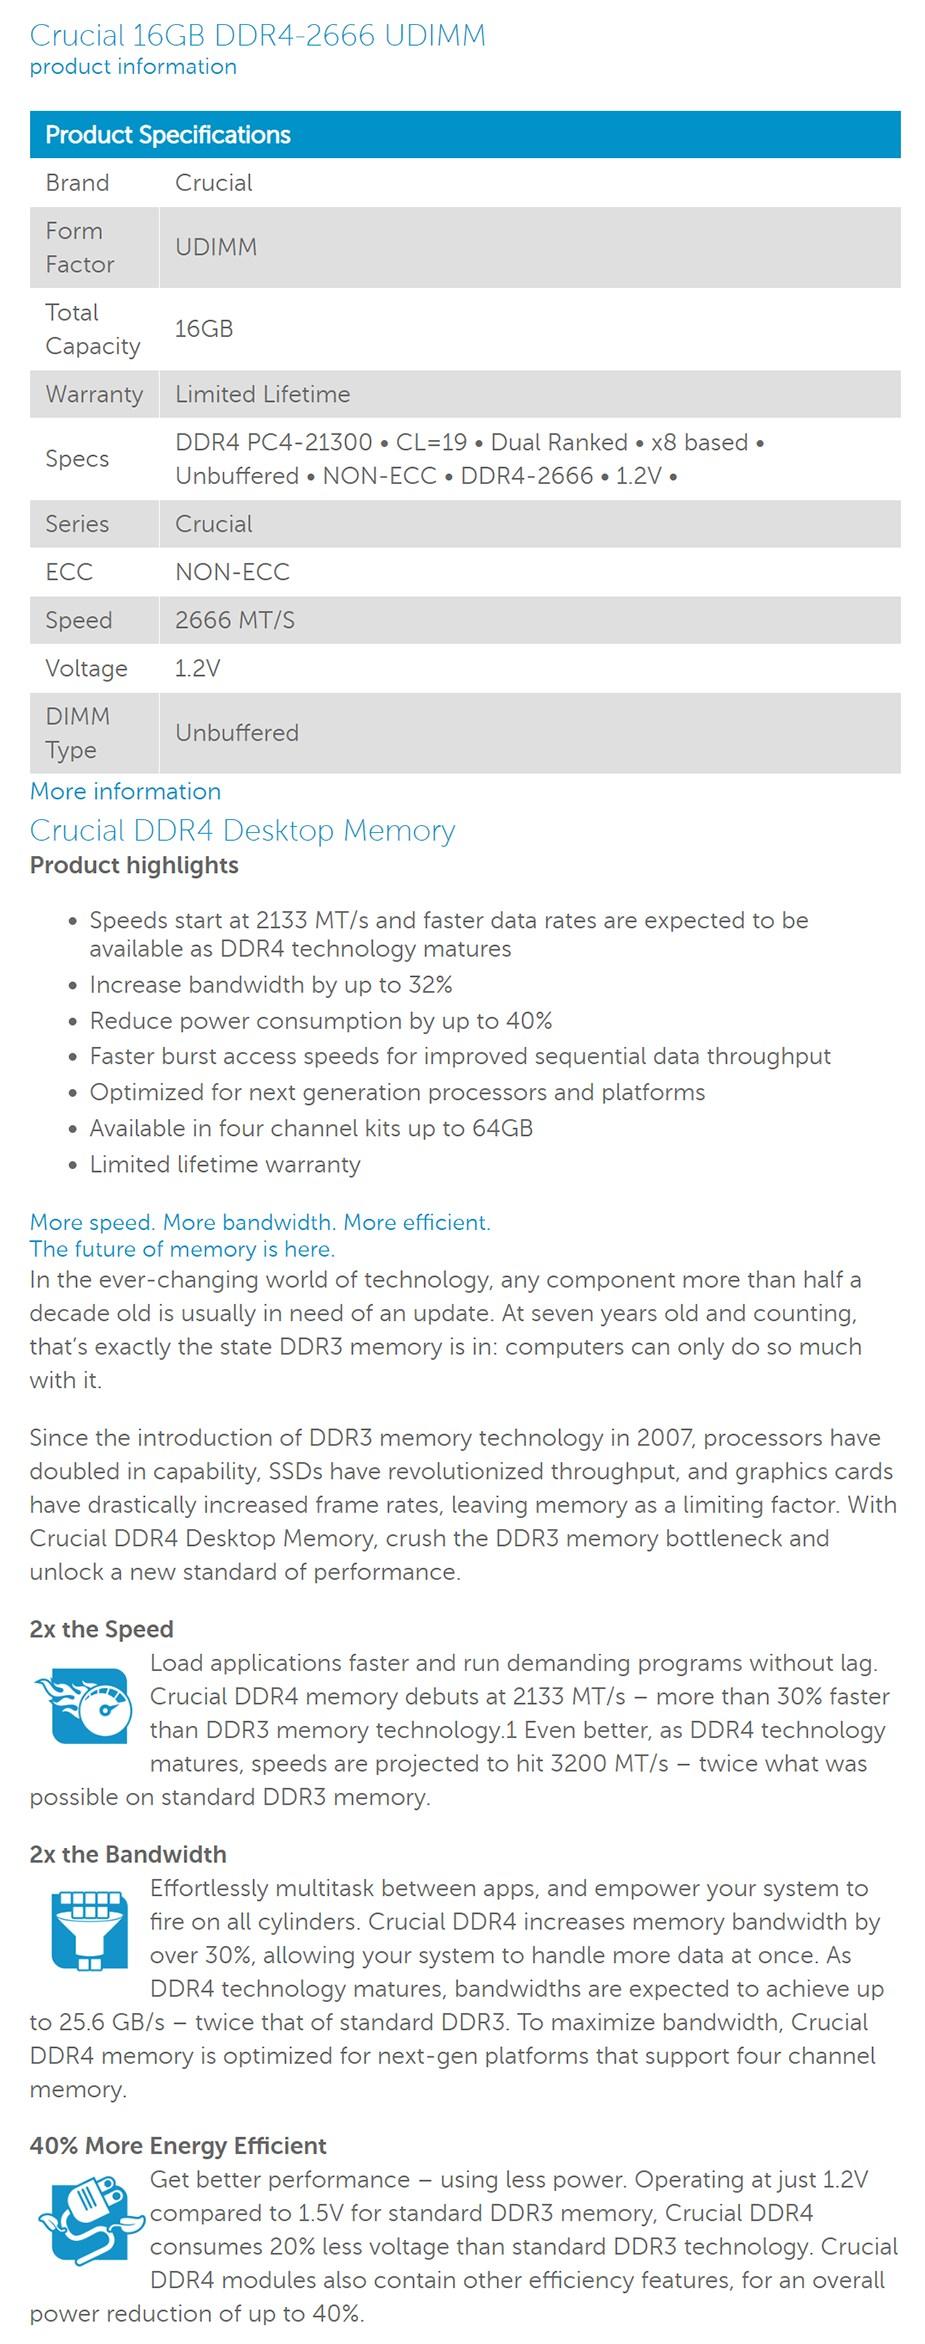 Crucial 16GB (1x 16GB) DDR4 2666MHz U-DIMM Desktop Memory - Desktop Overview 1